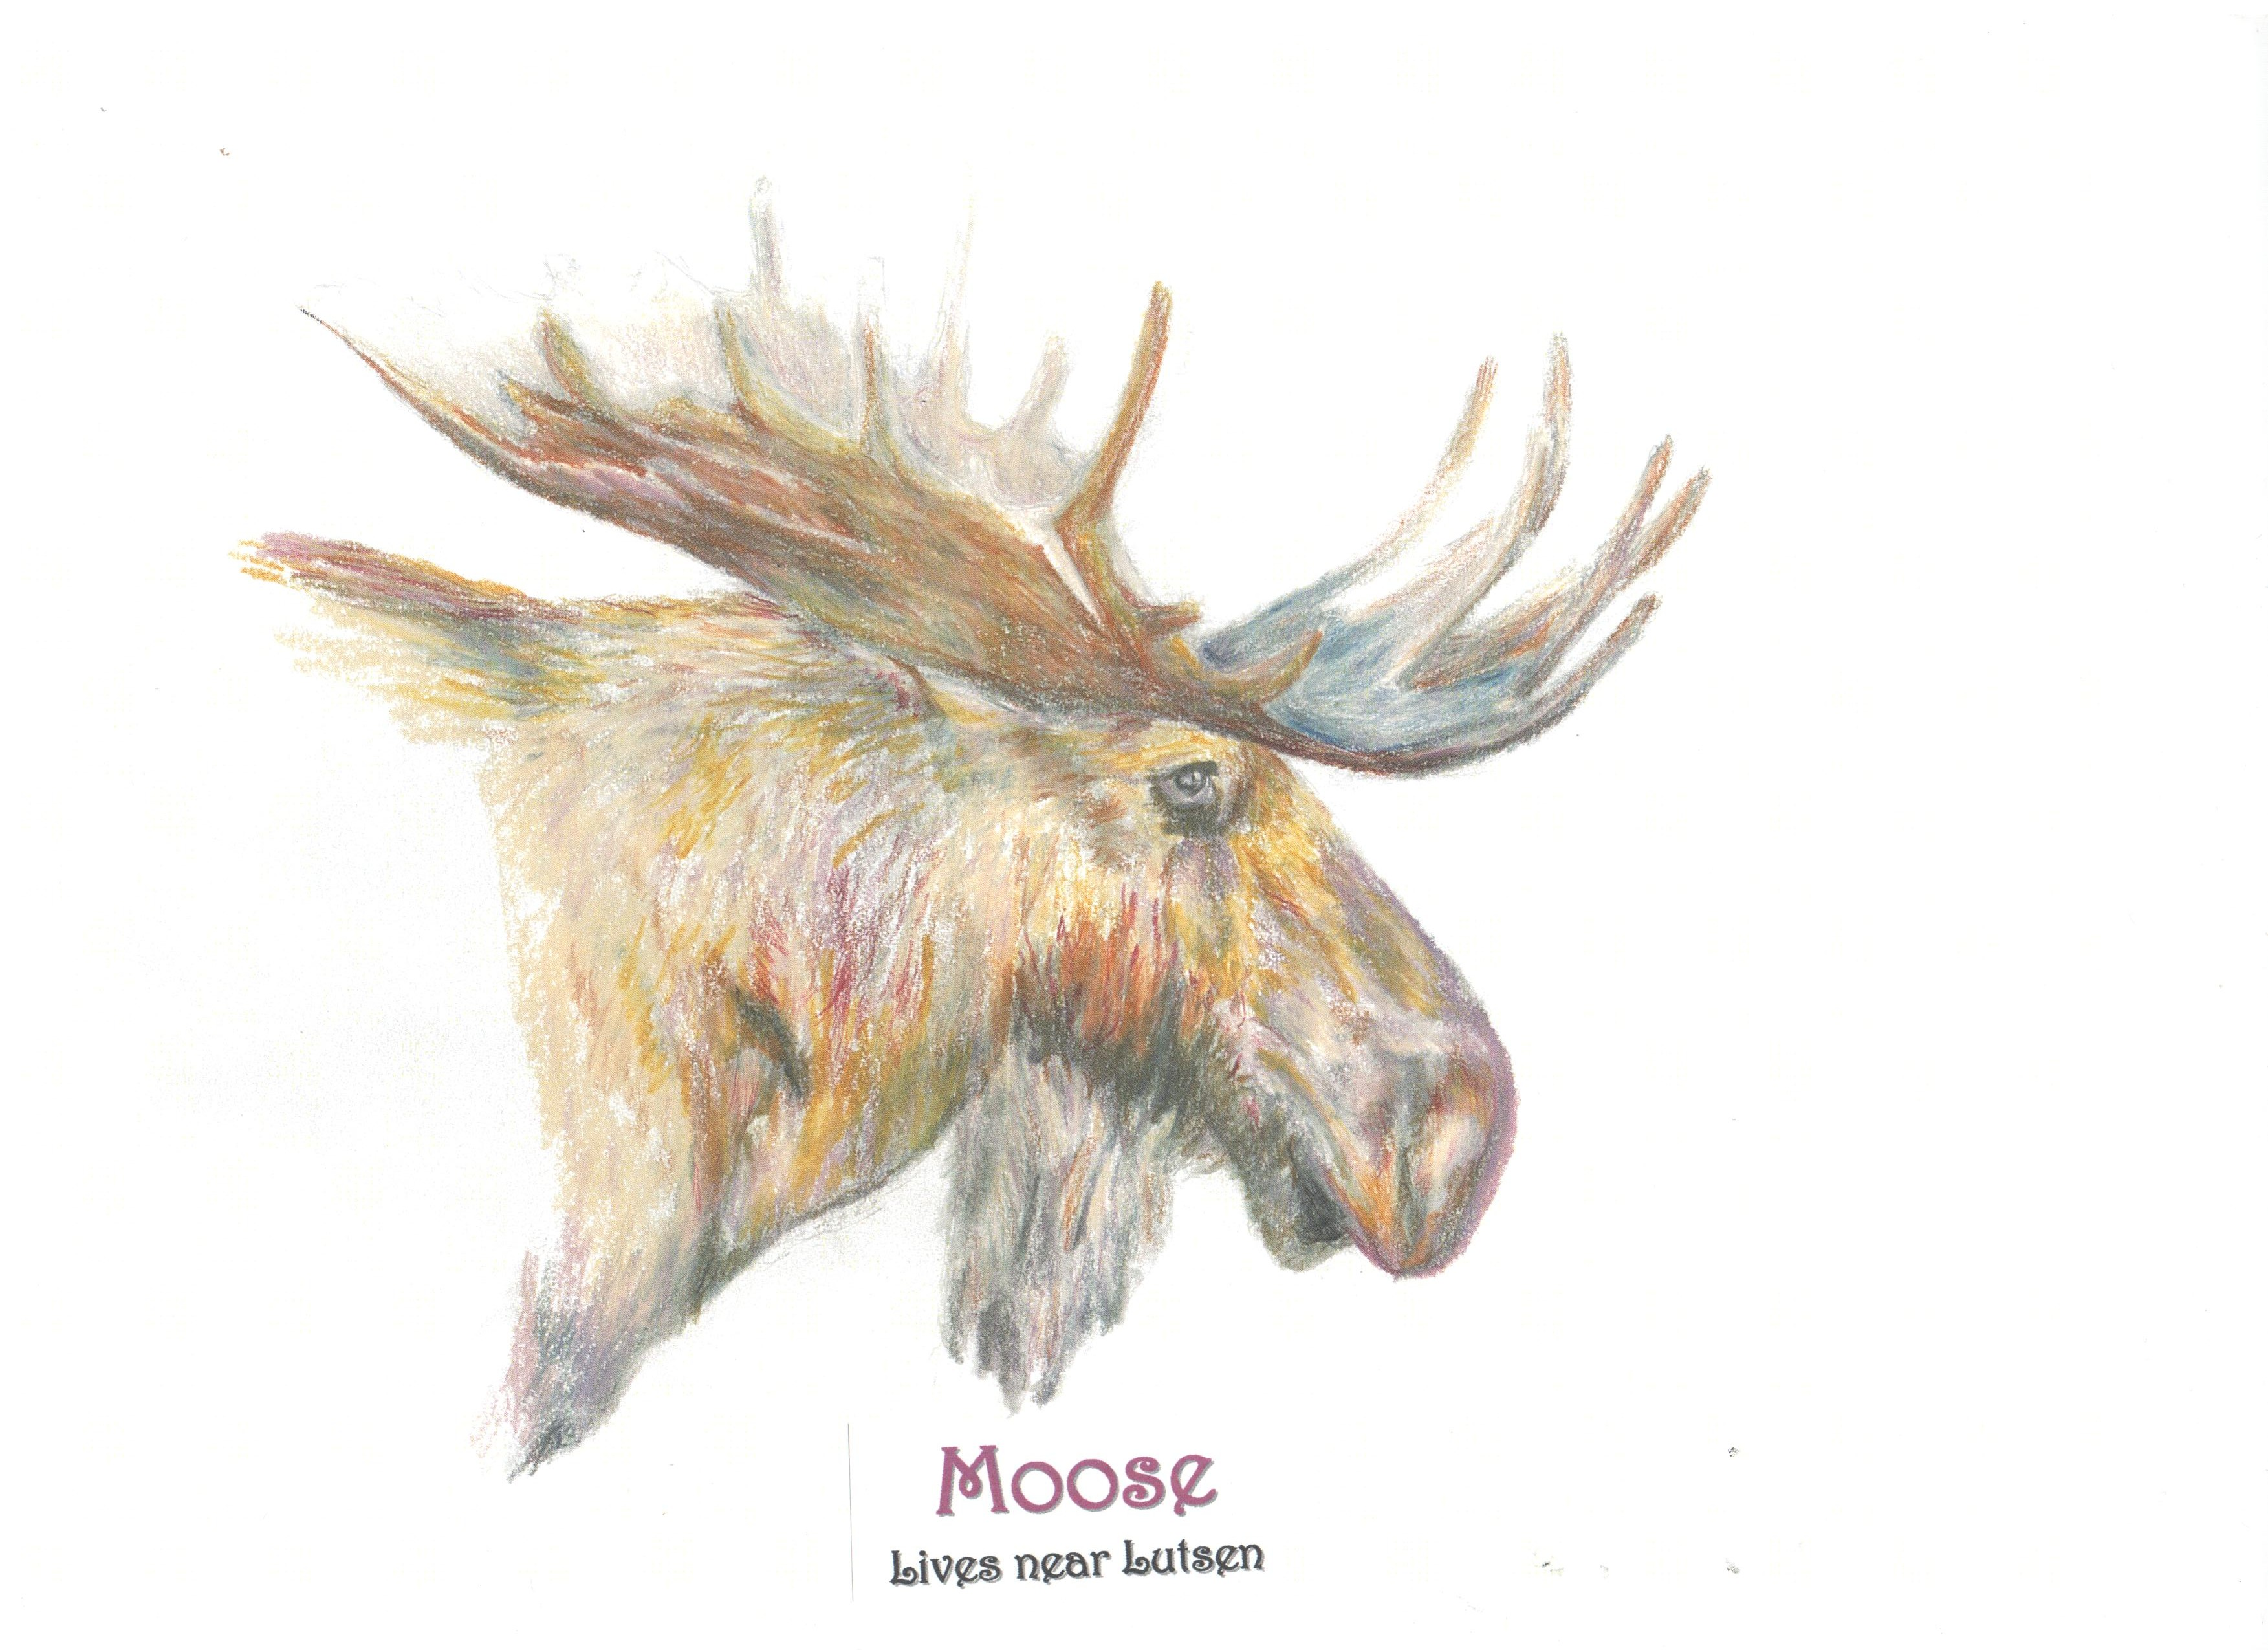 3506x2550 Moose Pencil, Watercolor Pencil Sketches By Jane Selstad